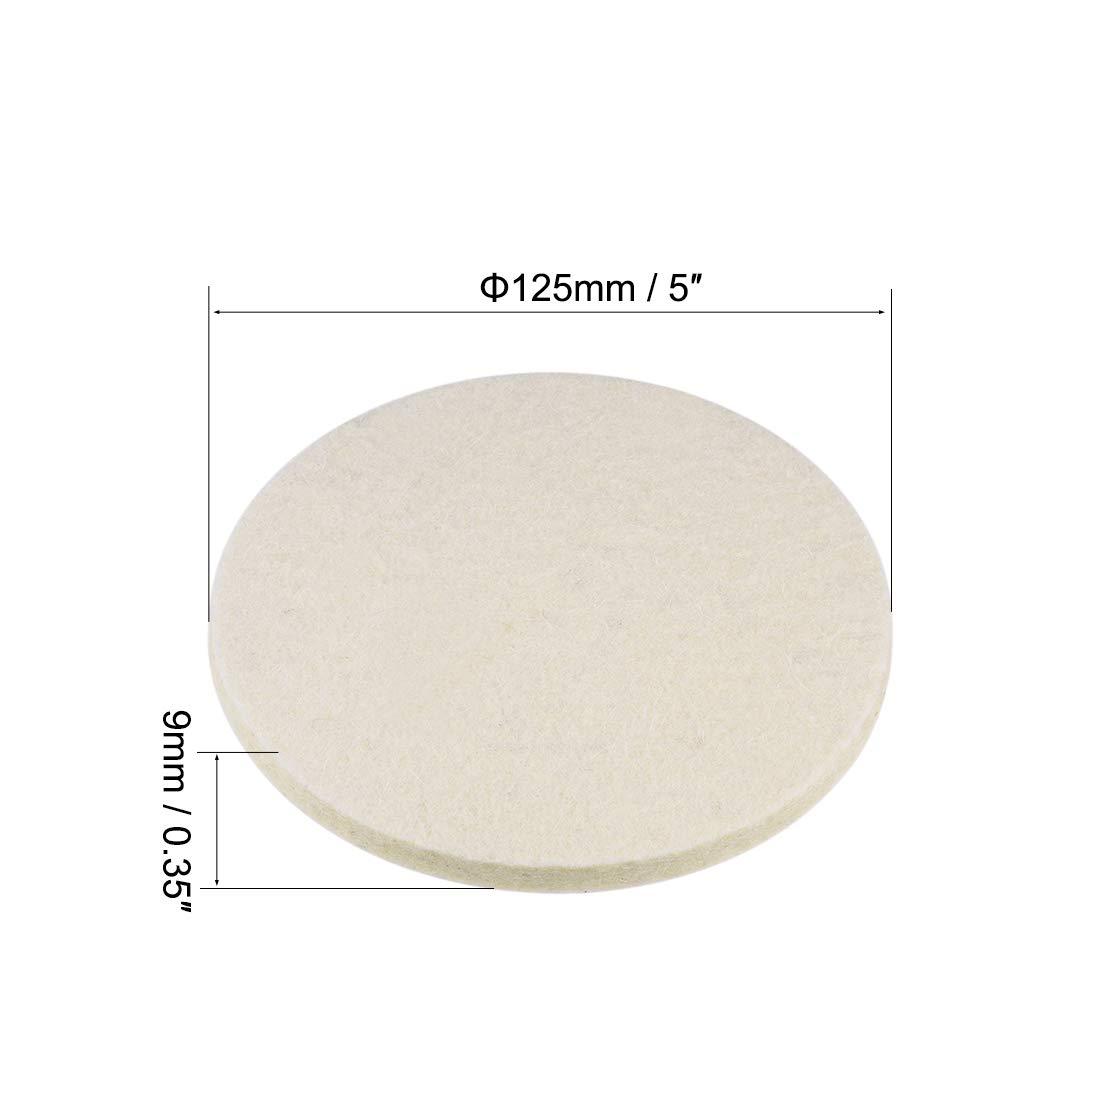 Buffing Wheels Polish Pad Disc,Flocking Hook /& Loop Back for Random Orbital Sander 4pcs sourcing map 4 inch Wool Felt Polishing Pad